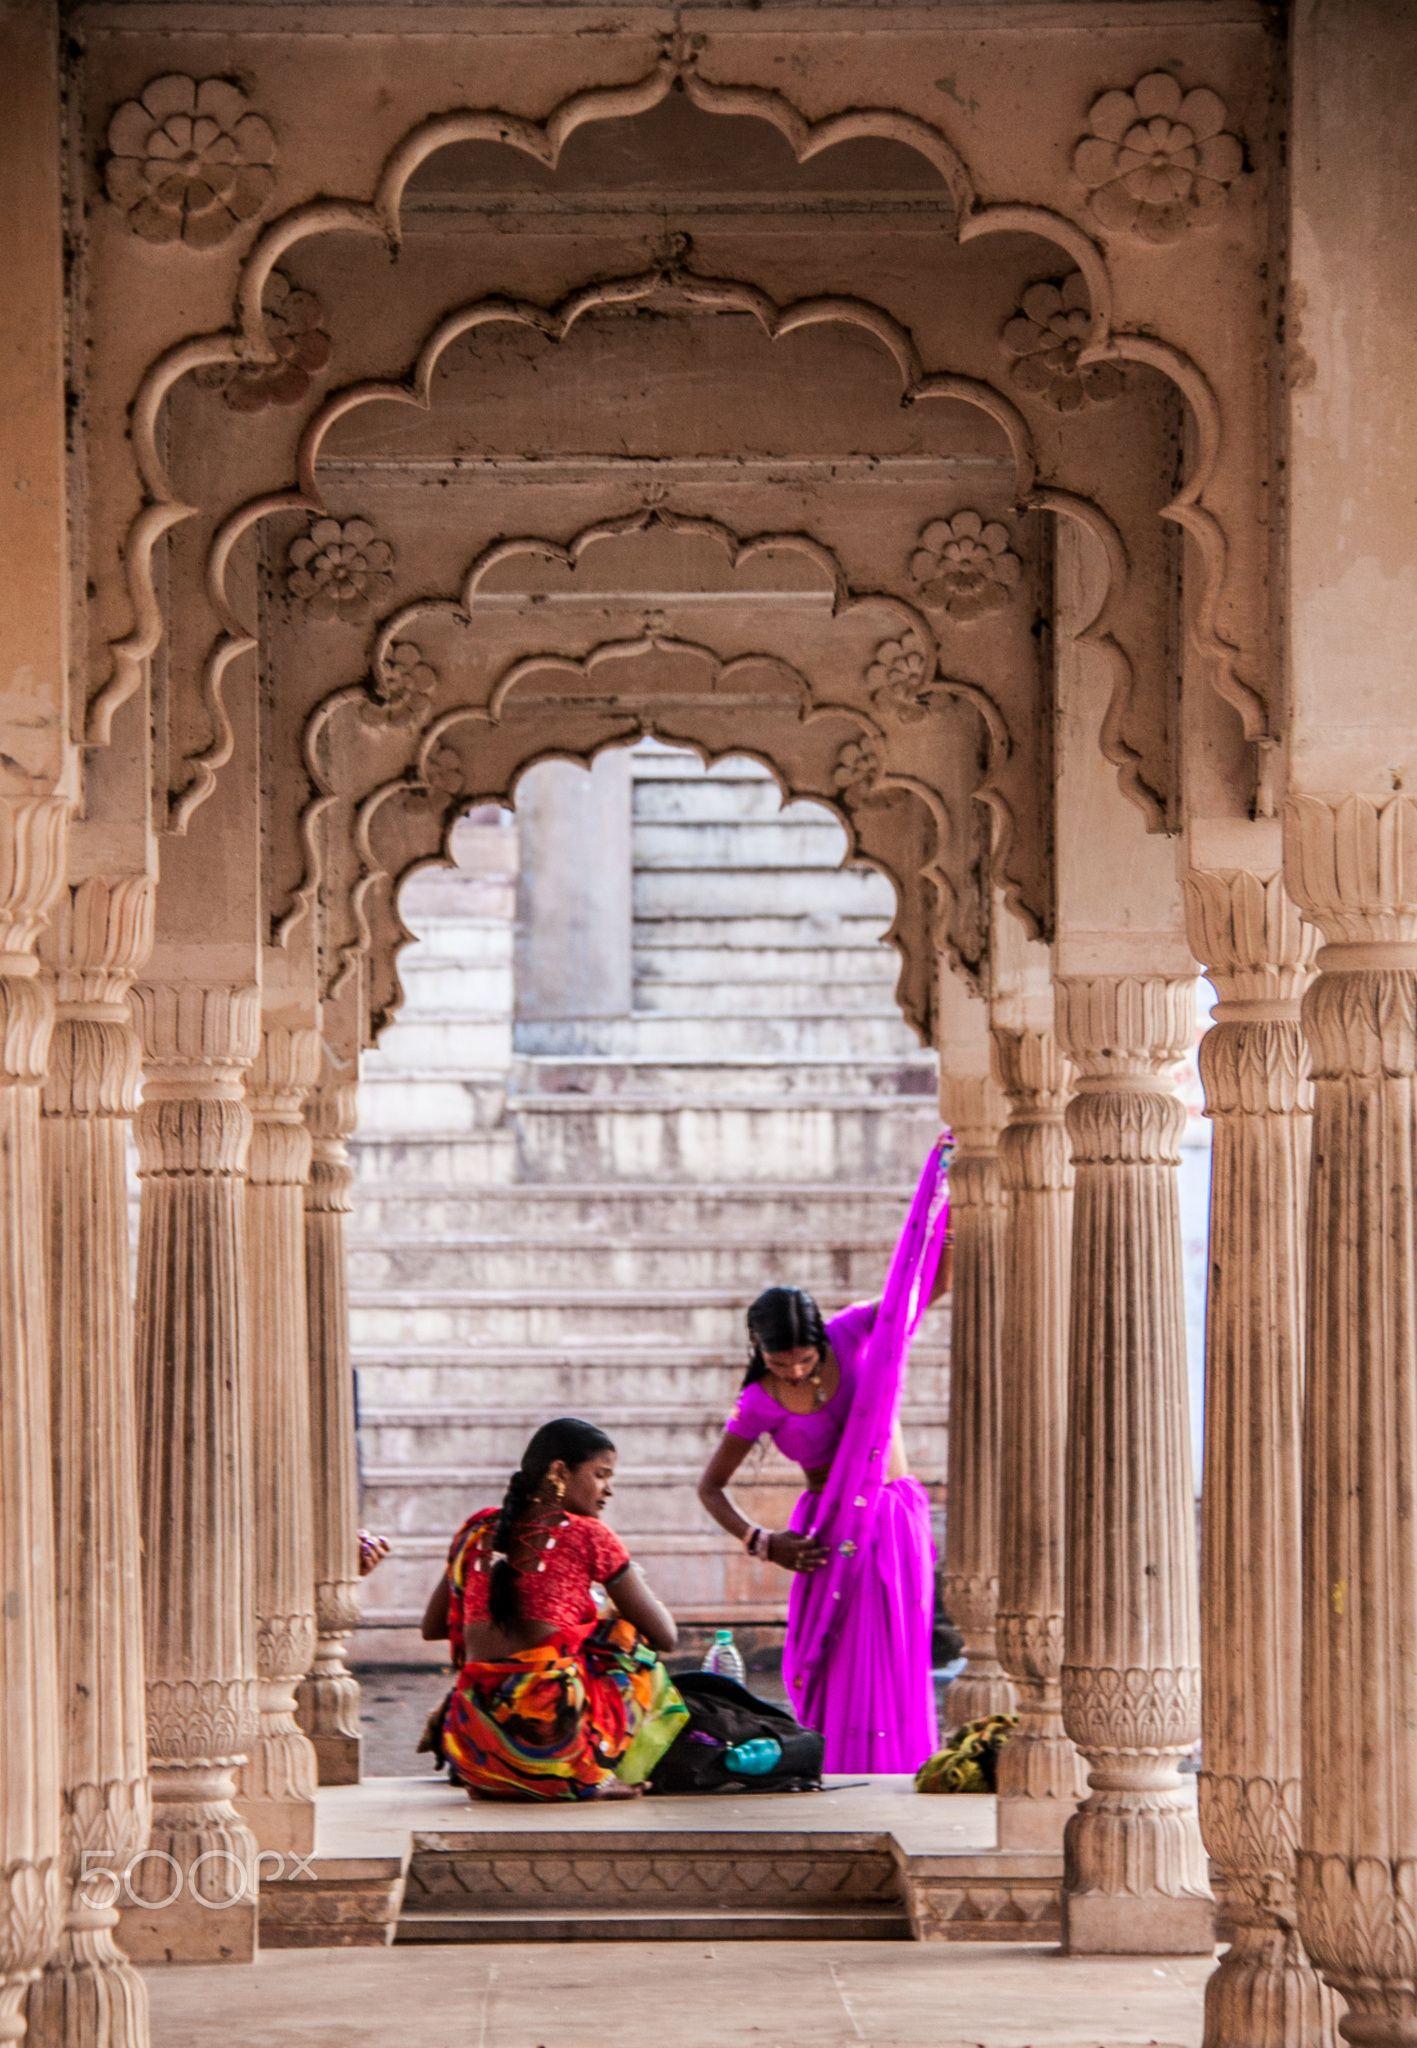 Saris at Pushkar Lake, India